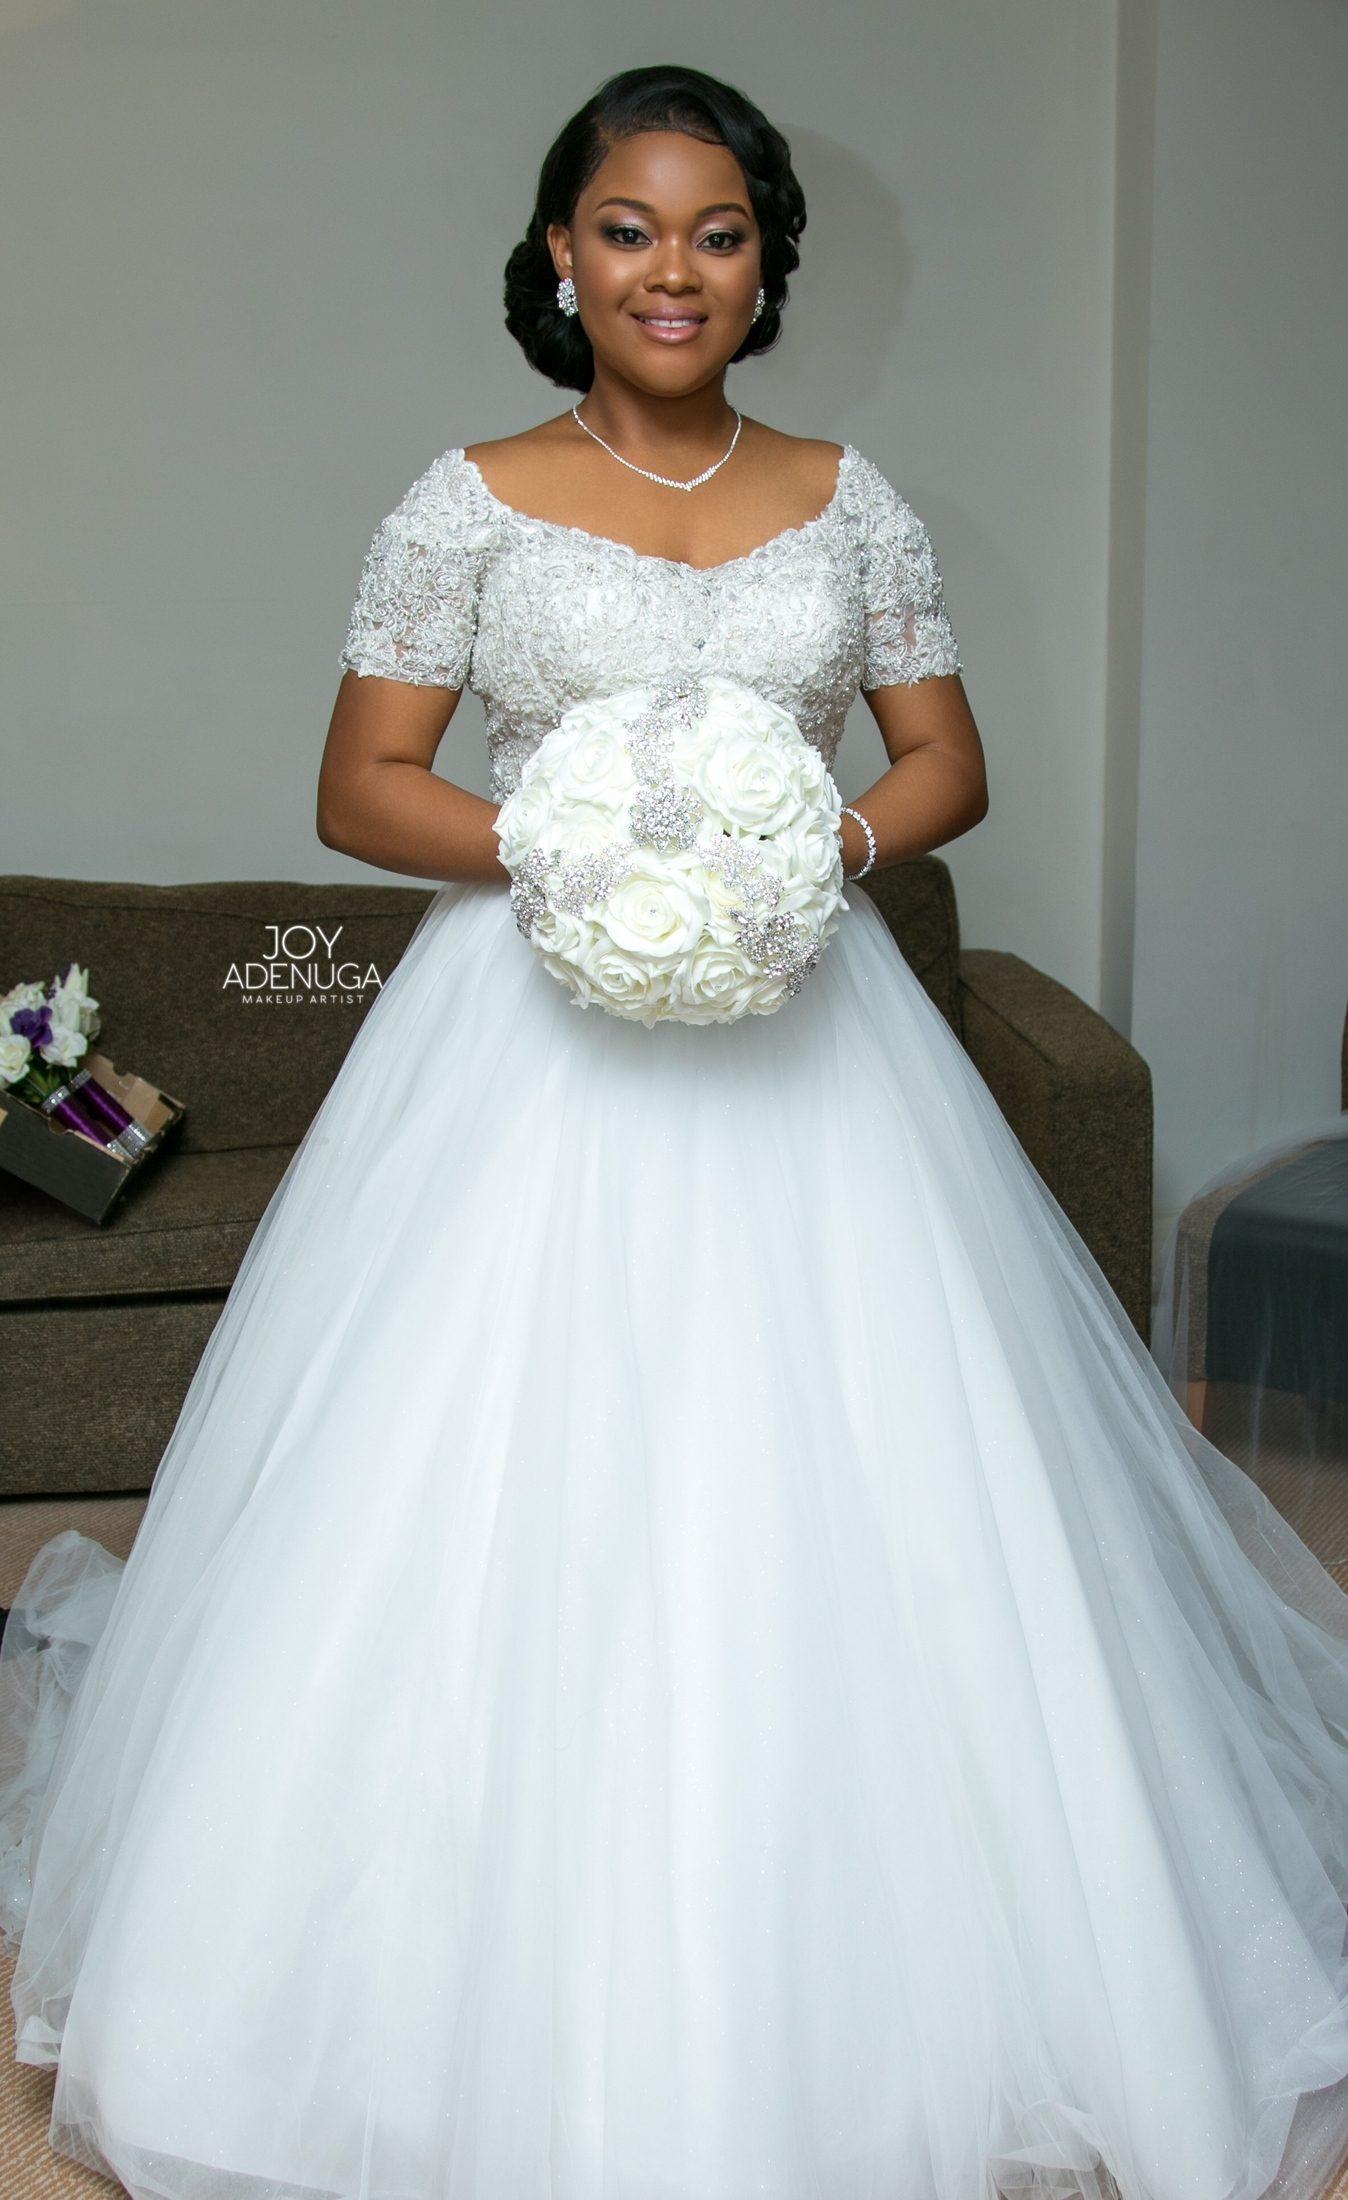 Daniella's Wedding, joy adenuga, Nigerian makeup artist, black bride, black bridal blog london, london black makeup artist, london makeup artist for black skin, black bridal makeup artist london, makeup artist for black skin, nigerian makeup artist london, makeup artist for women of colour